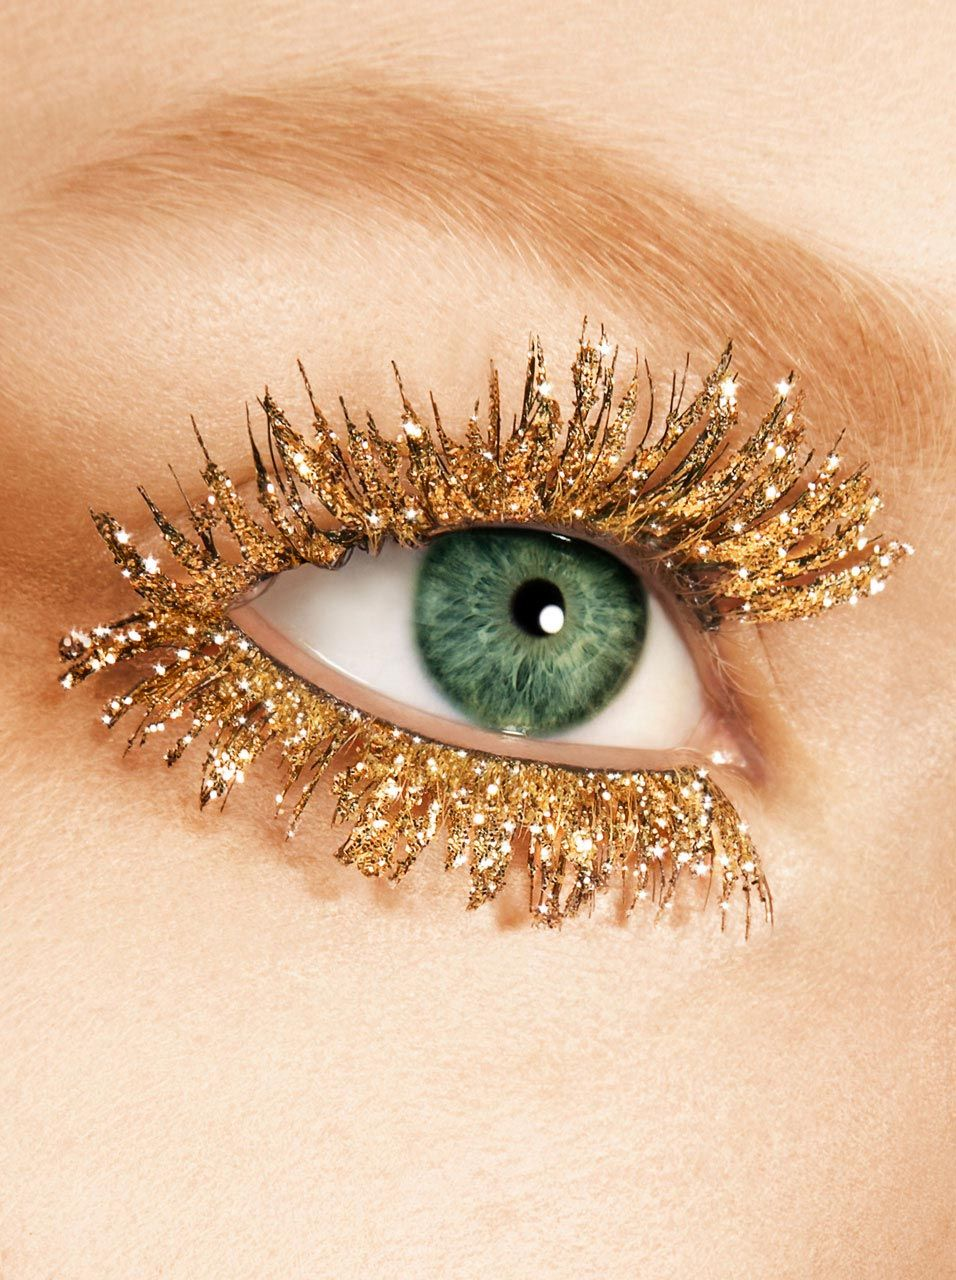 Seb Winter Photography. Gold glitter lasheshttp://www.eyeshadowlipstick.com/12196/seb-winter-photography/gold-glitter-mascara/#